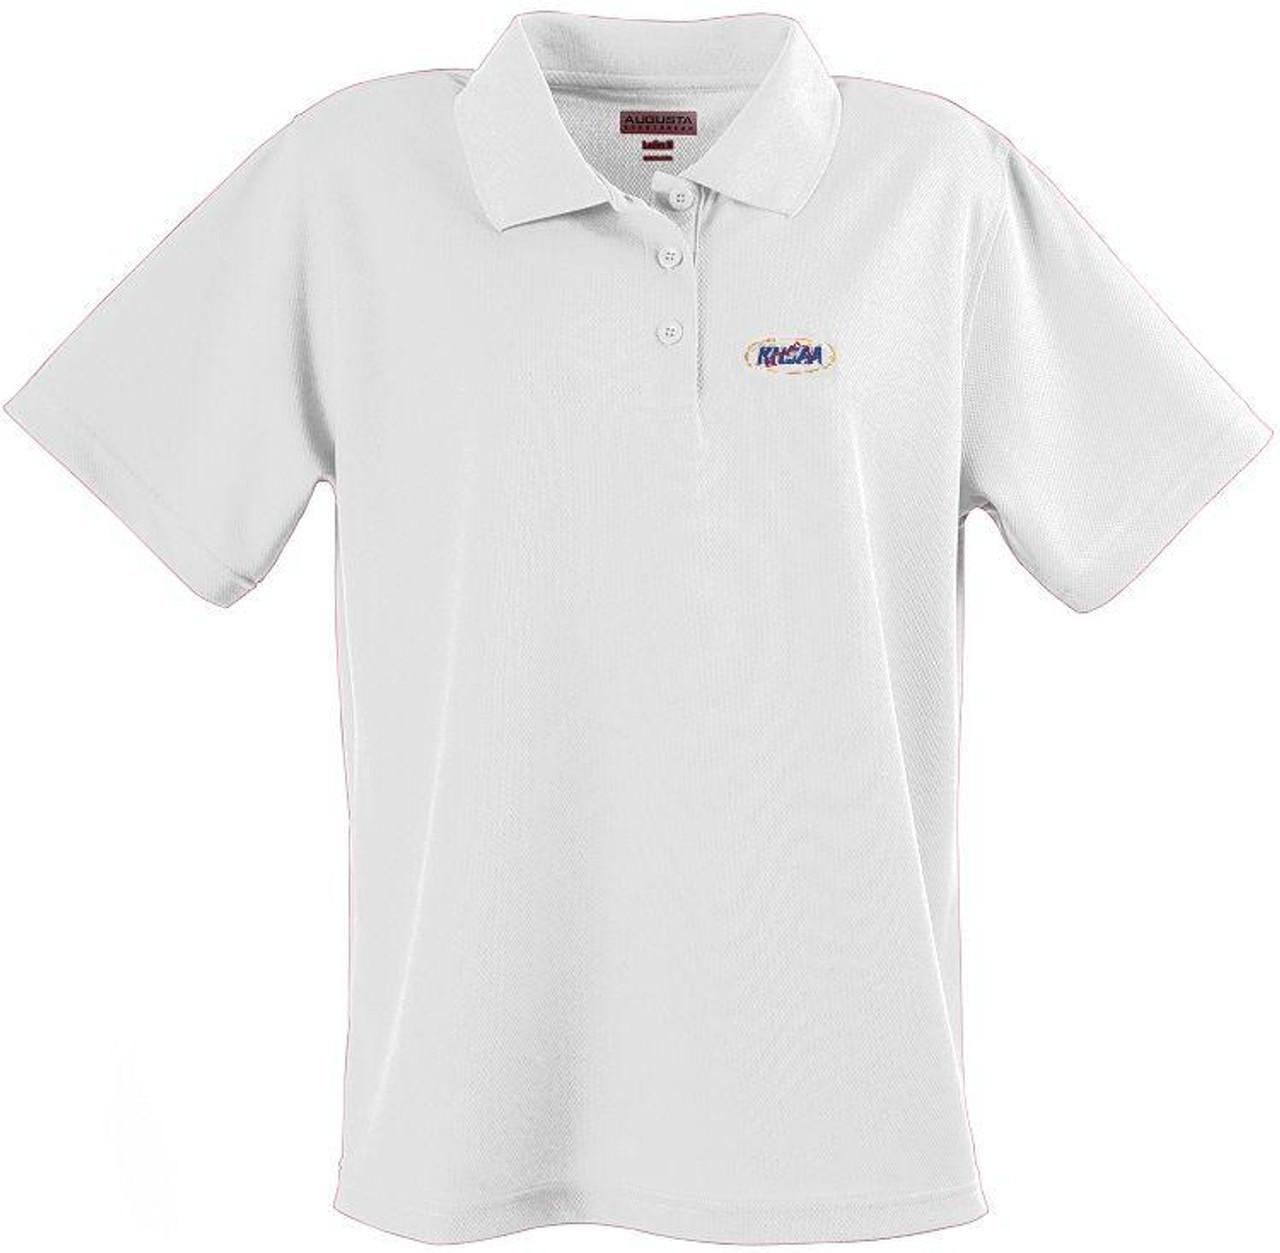 Augusta Women's KHSAA Volleyball & Swimming Referee Shirt